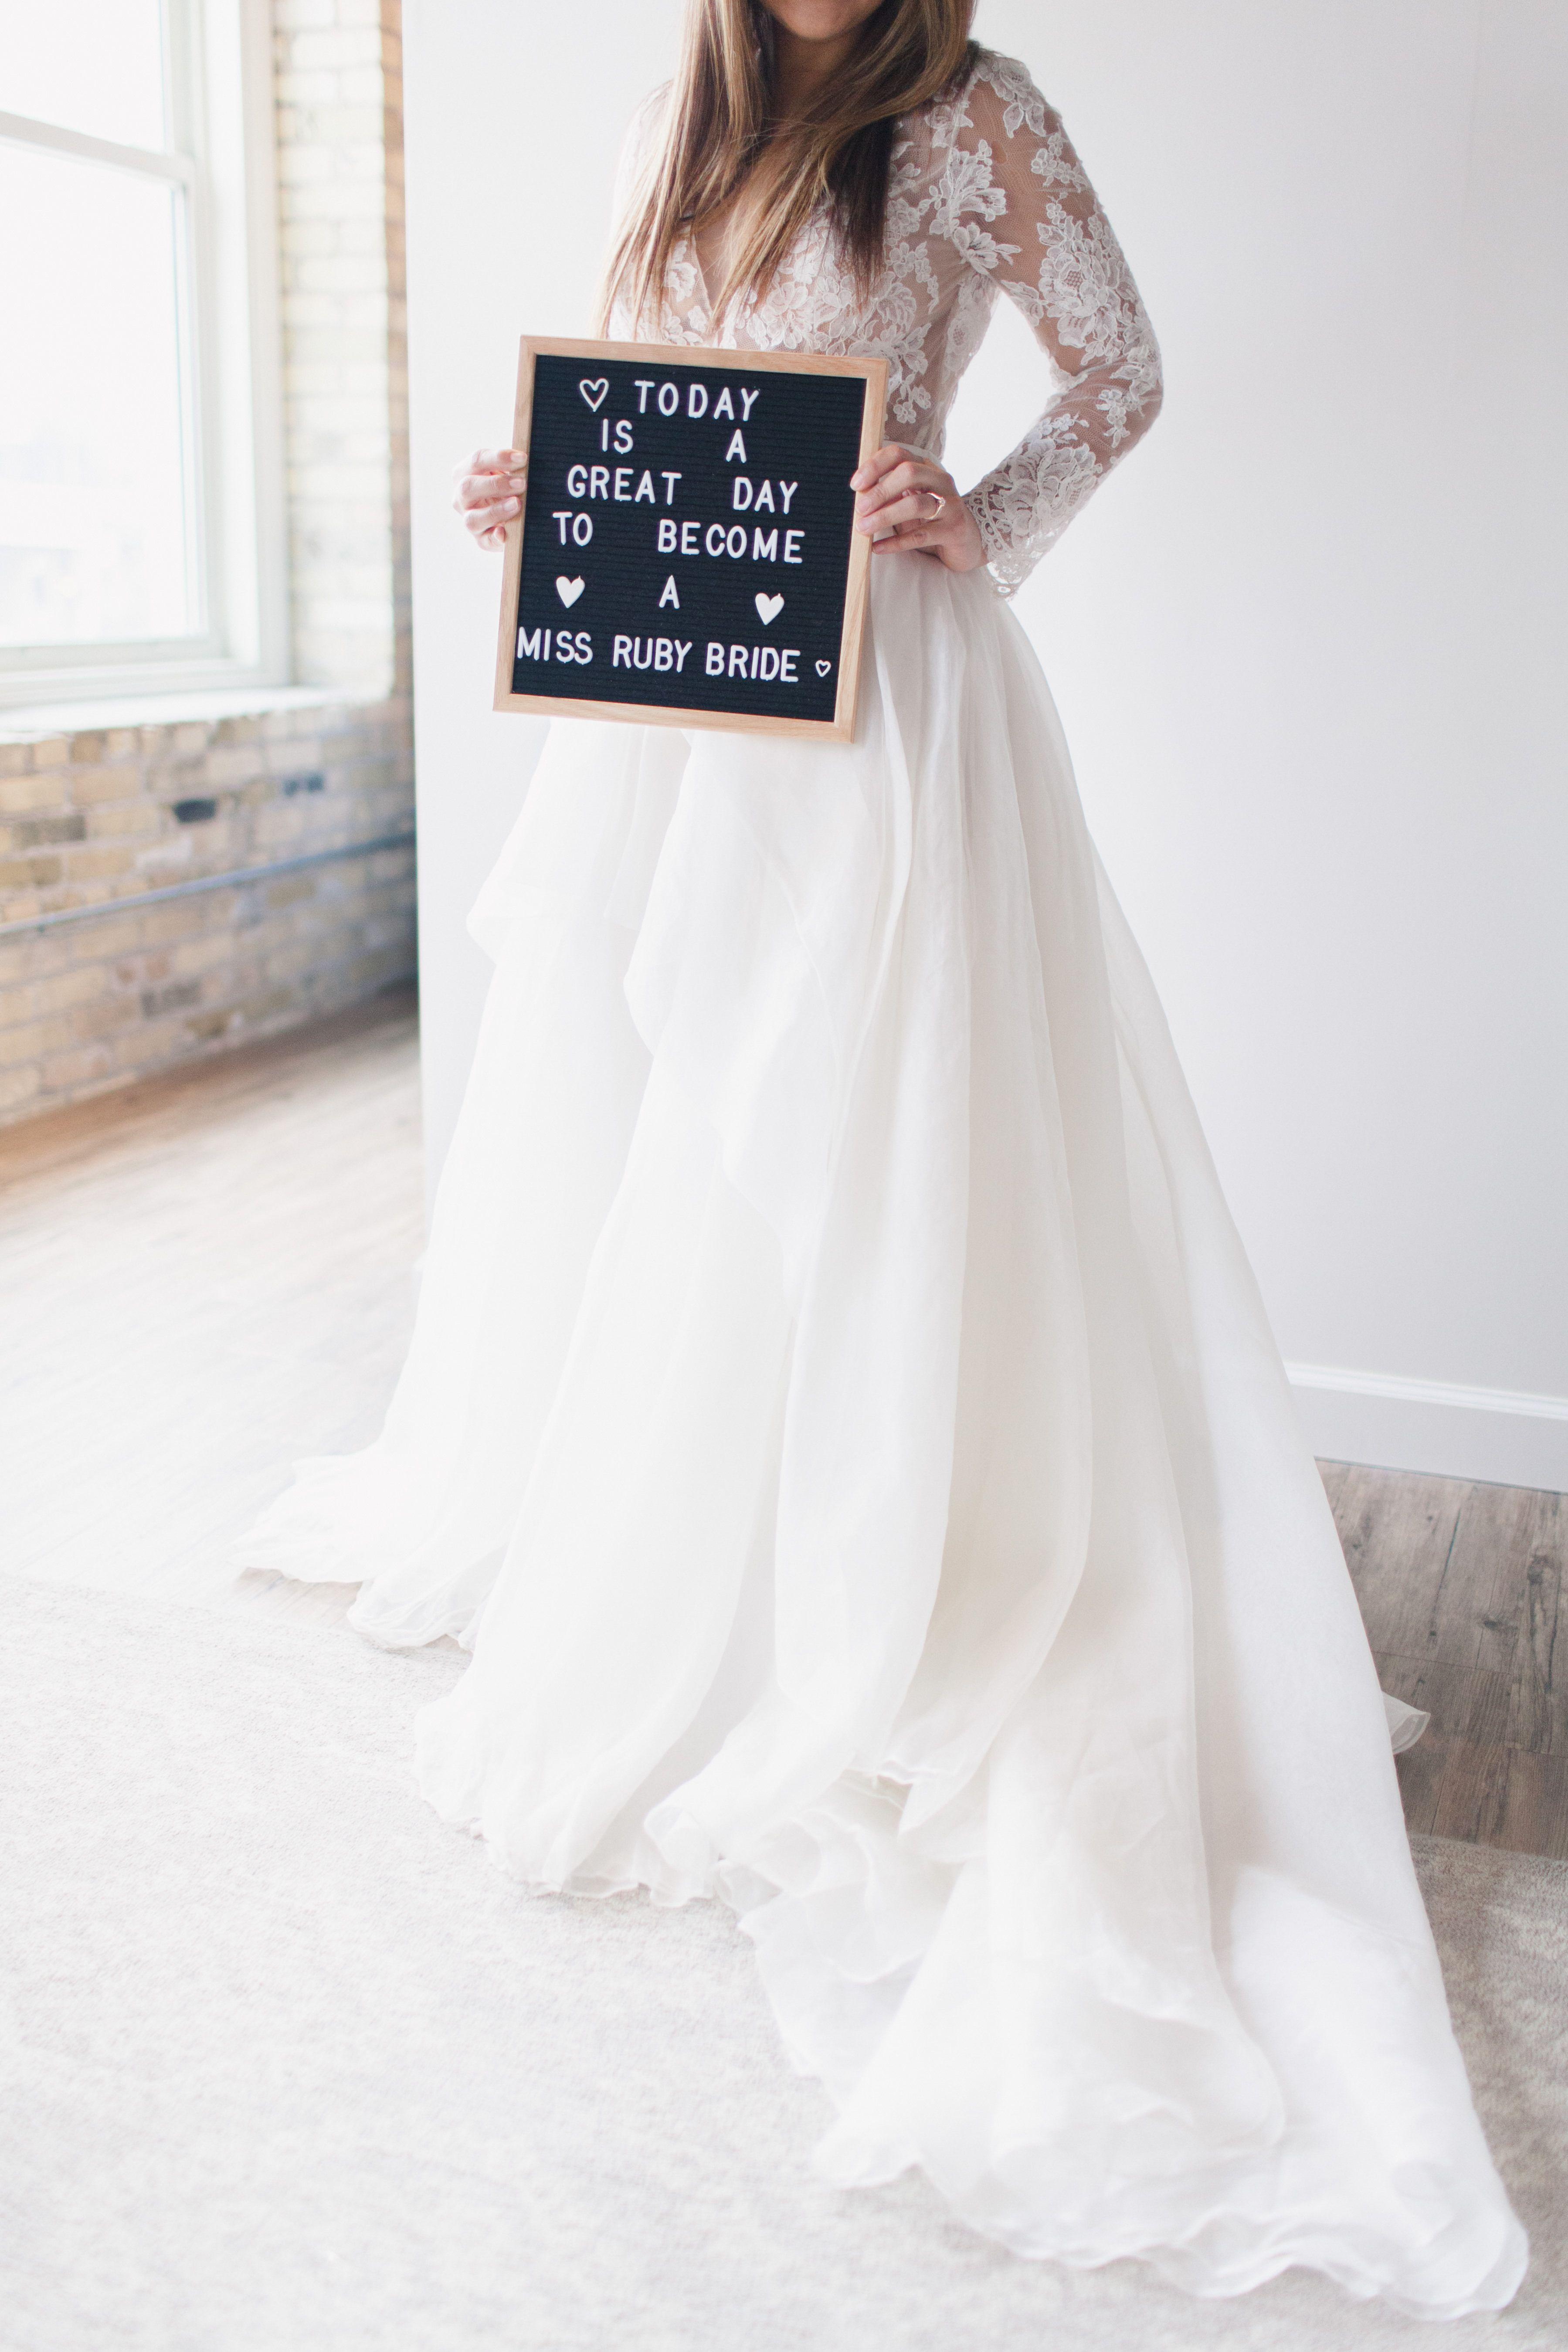 Cozy Bridal Boutique In Milwaukee S Third Ward In 2020 Bridal Boutique Bridal Bridal Style